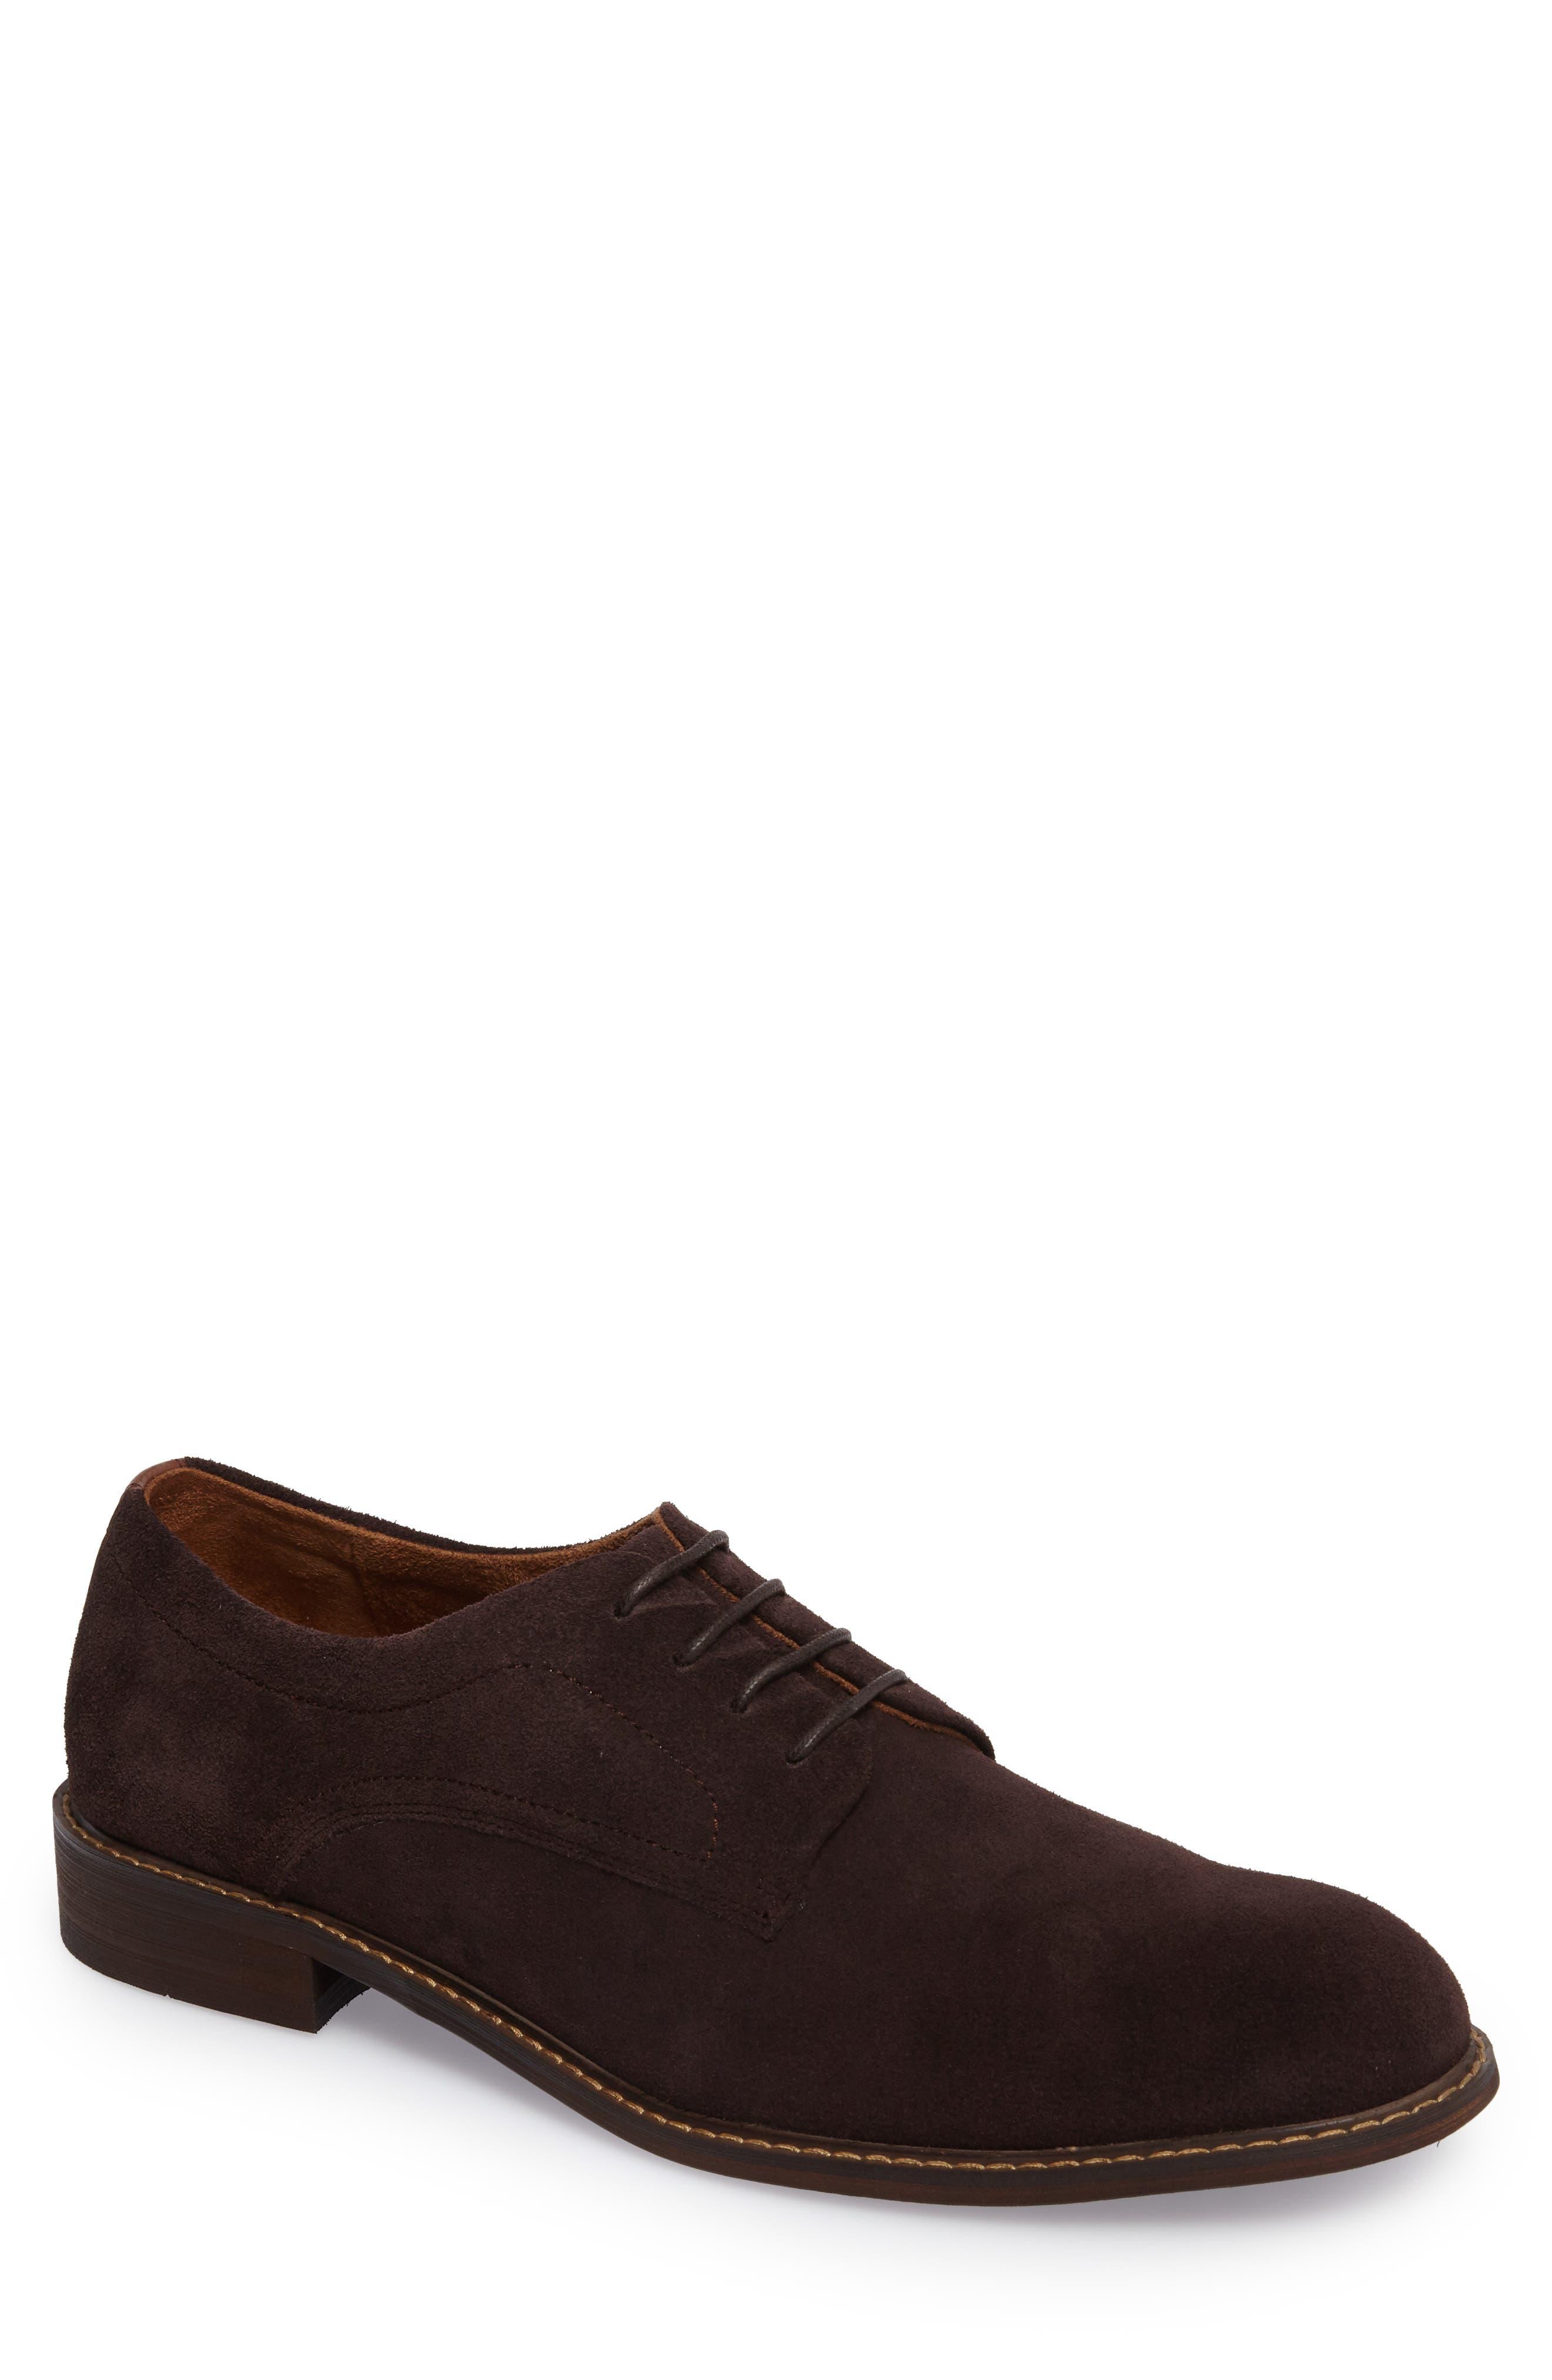 Buck Shoe,                             Main thumbnail 1, color,                             Chocolate Suede